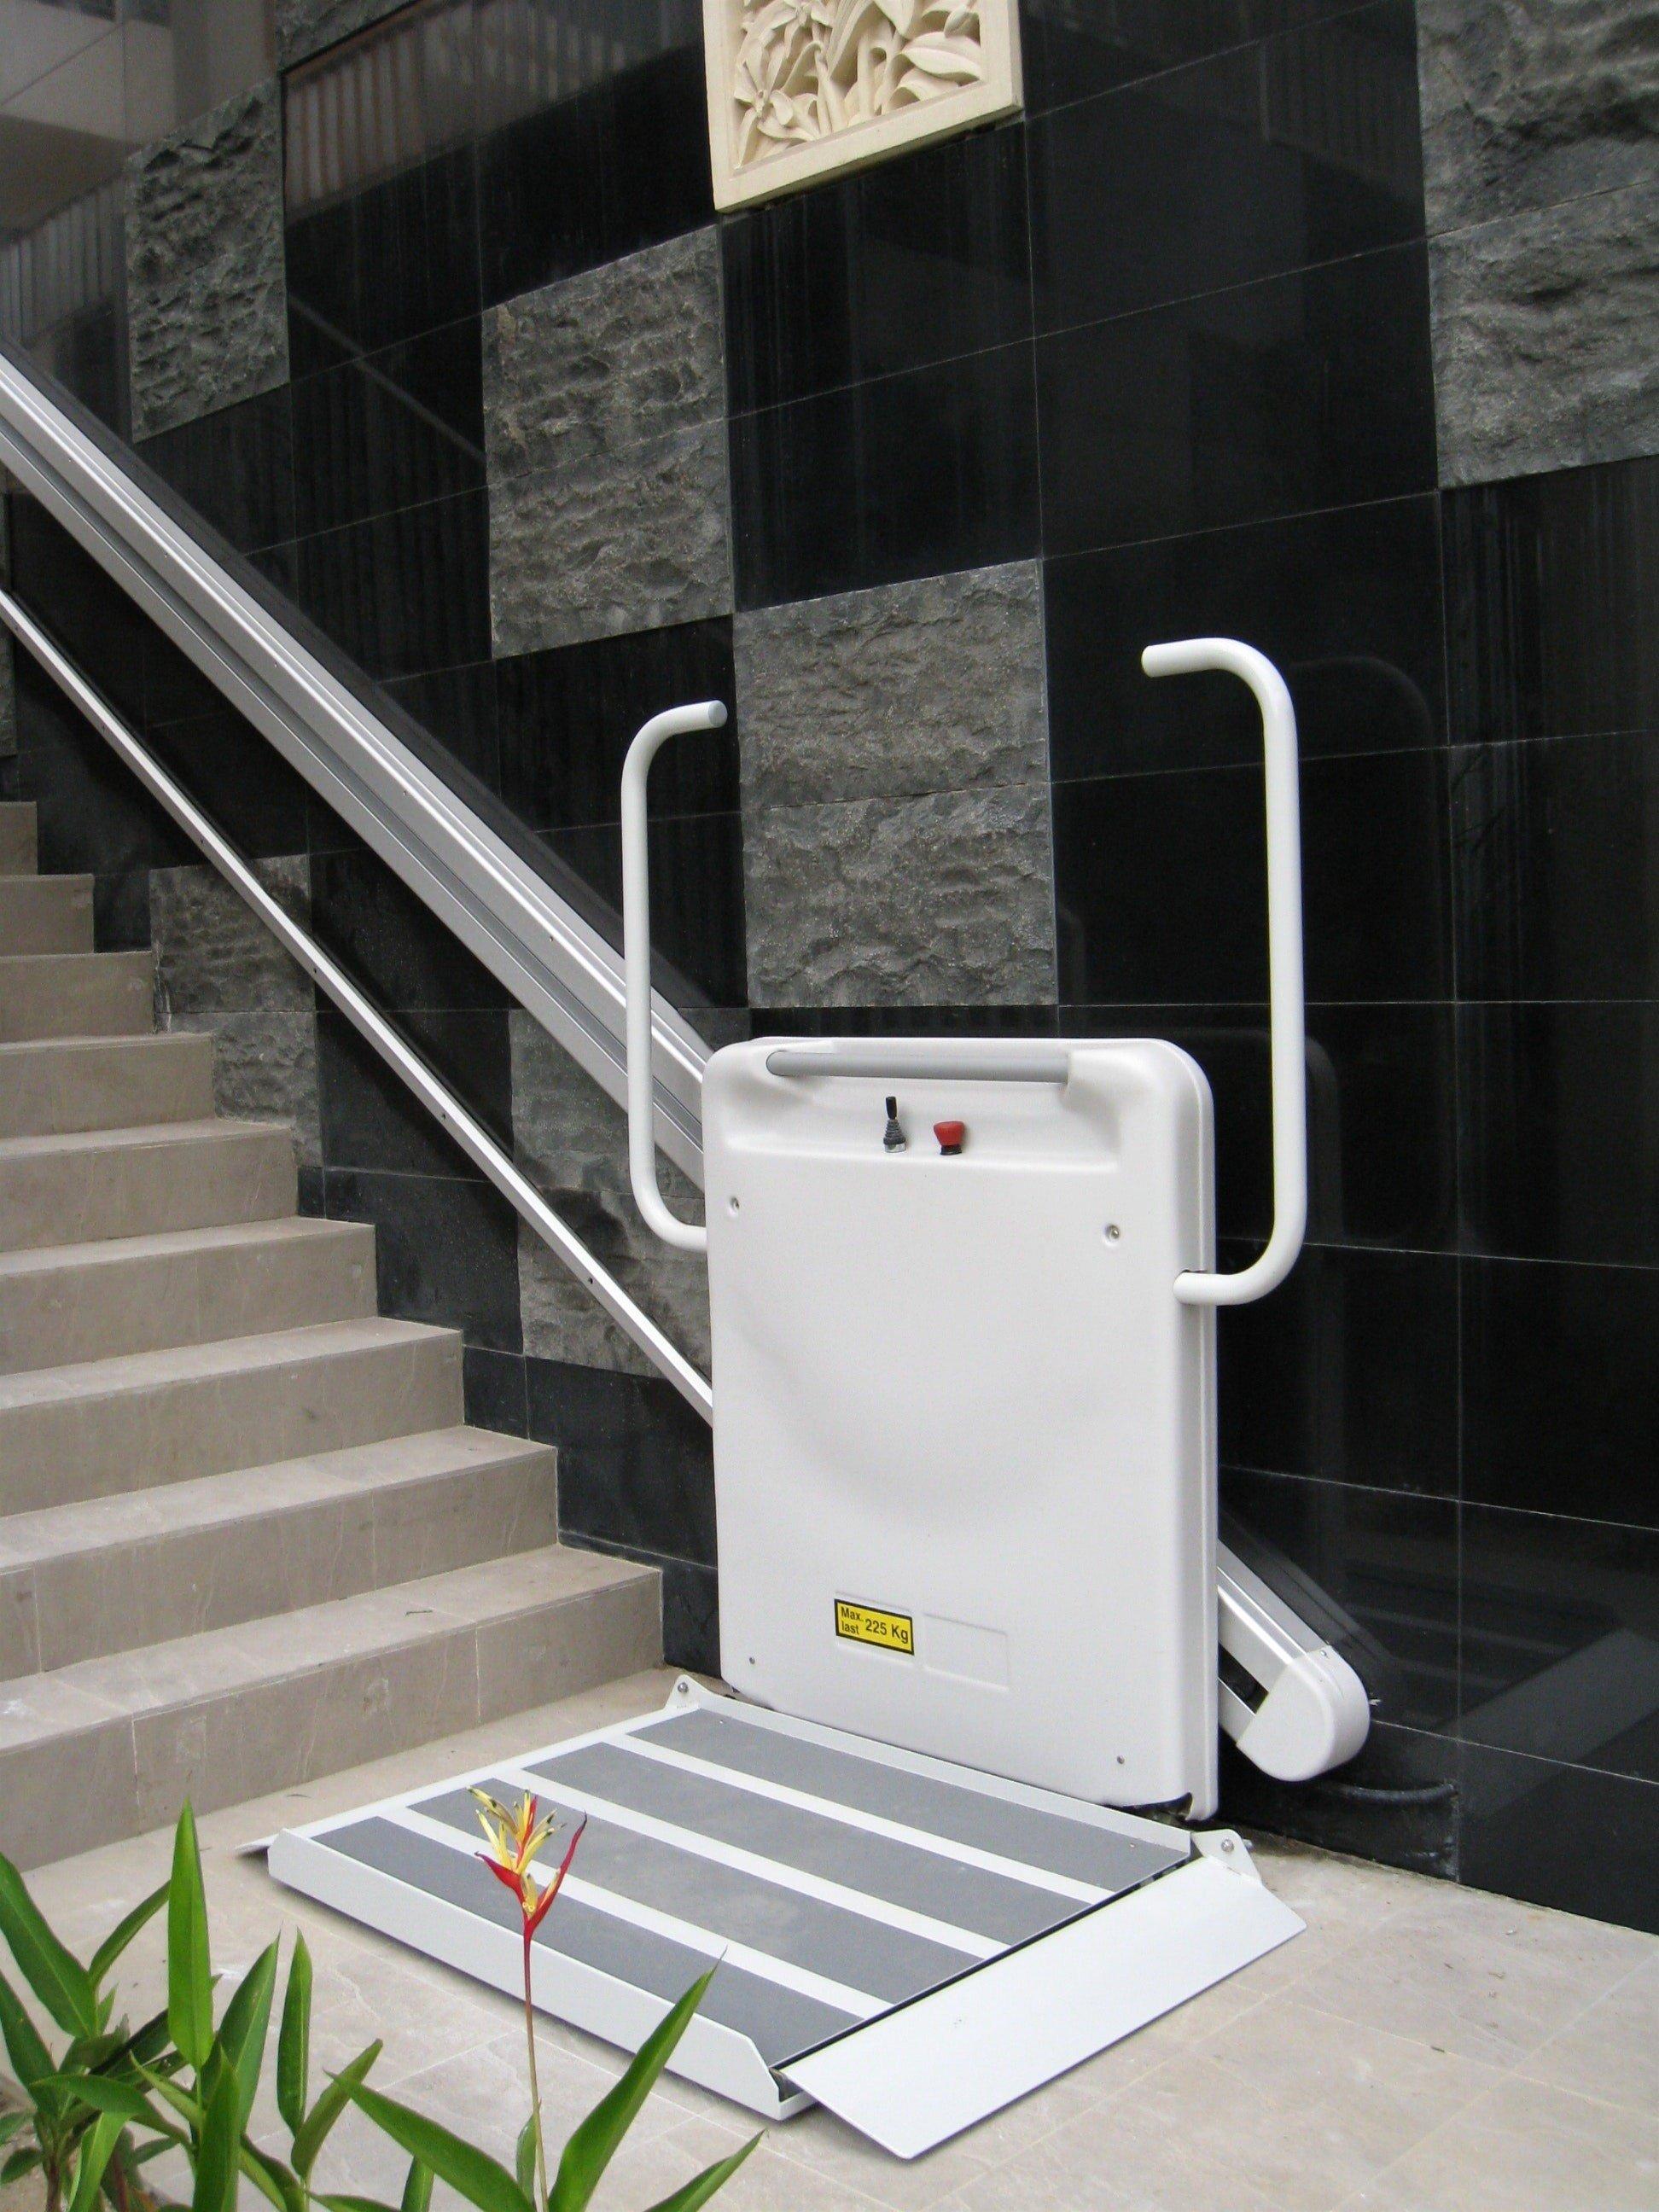 monte escalier occasion belgique